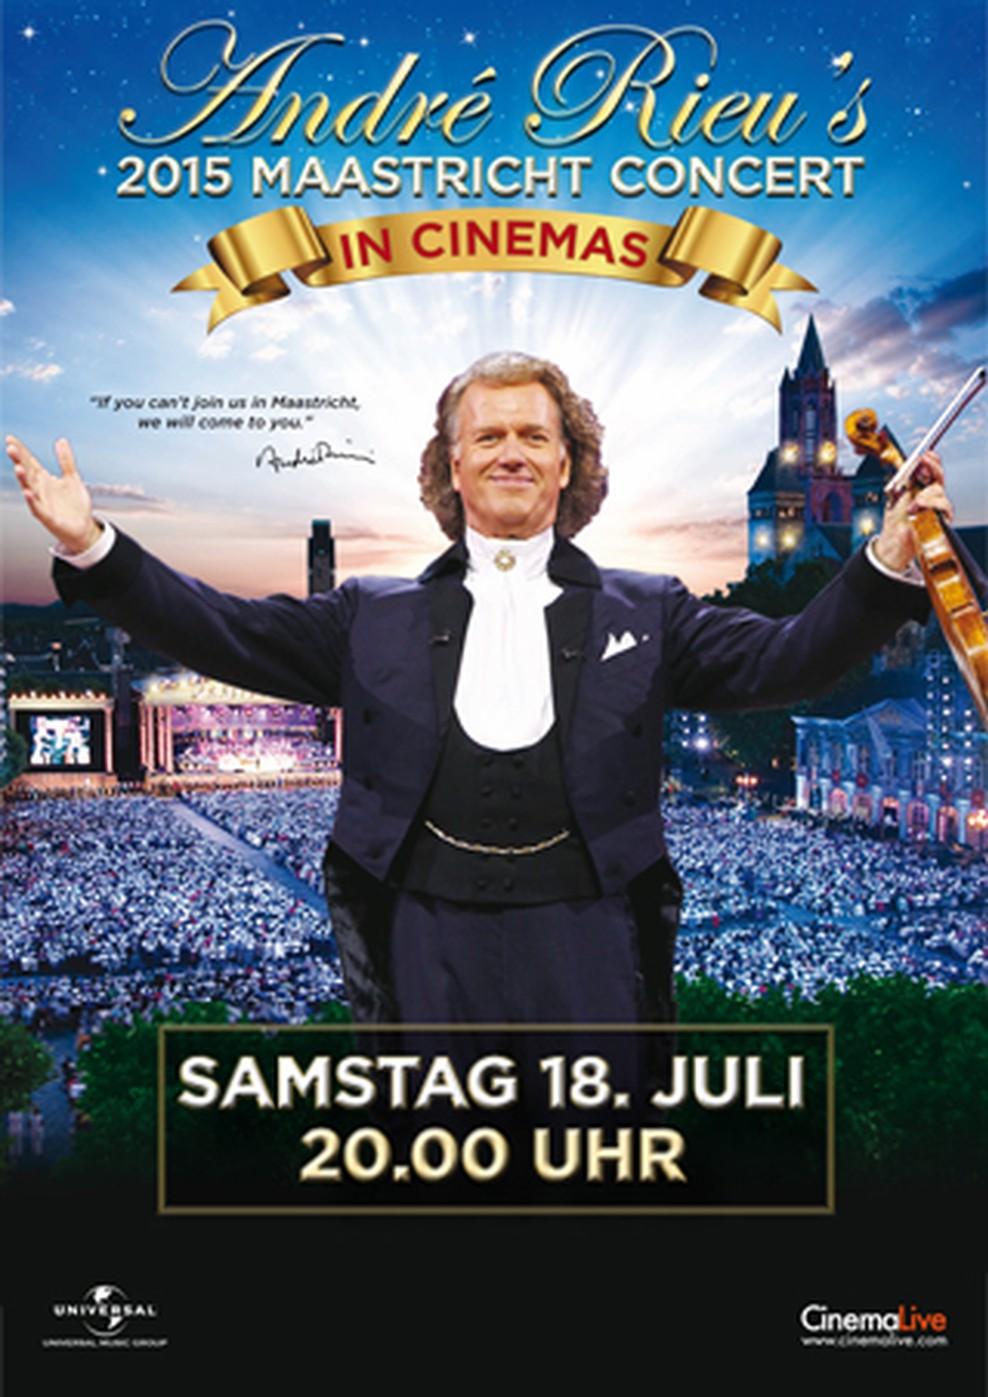 Andre Rieu's Maastricht Concert 2015 (Poster)